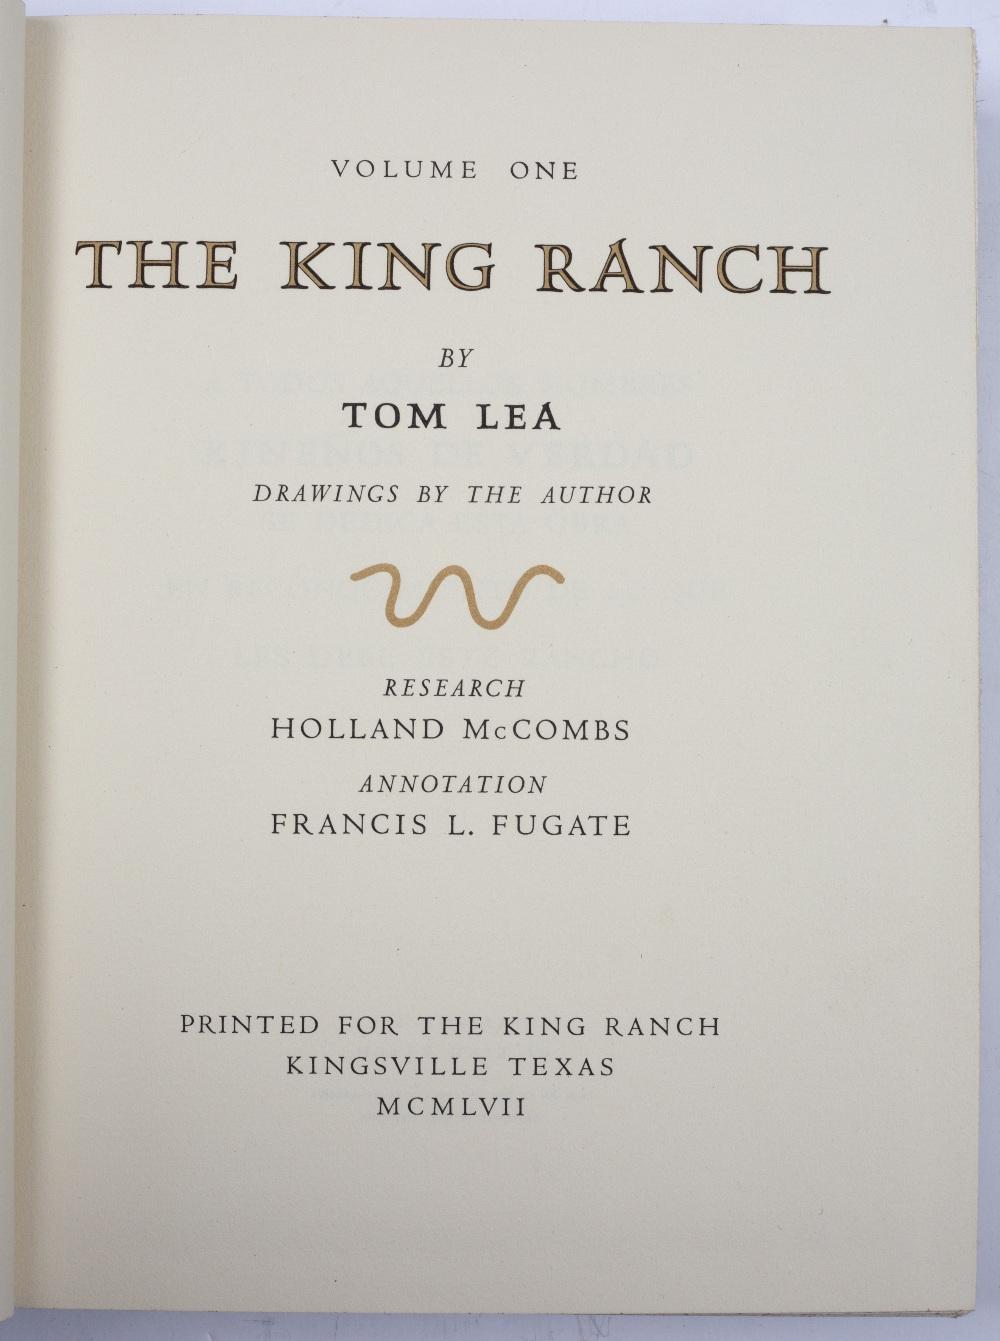 LEA, Tom, The King Ranch, Kingsville Texas. Carl Hertzog, El Paso 1957. Saddle Blanket Edition. - Image 2 of 7